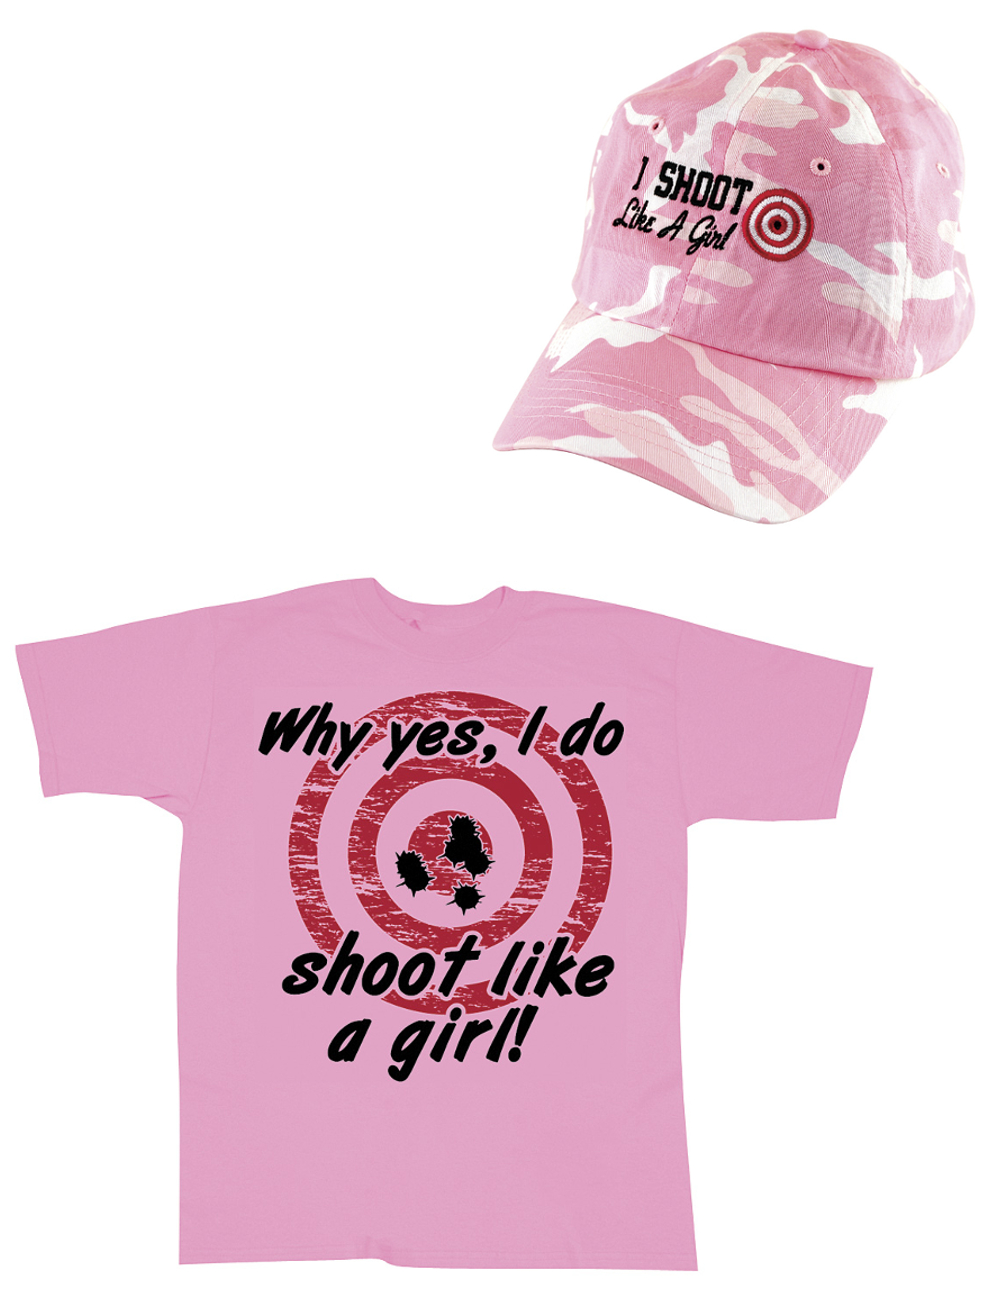 Closeout Zone (Set) I Shoot Like A Girl Baseball Cap & Lady Marksman Bullseye Pink Tee MD at Sears.com